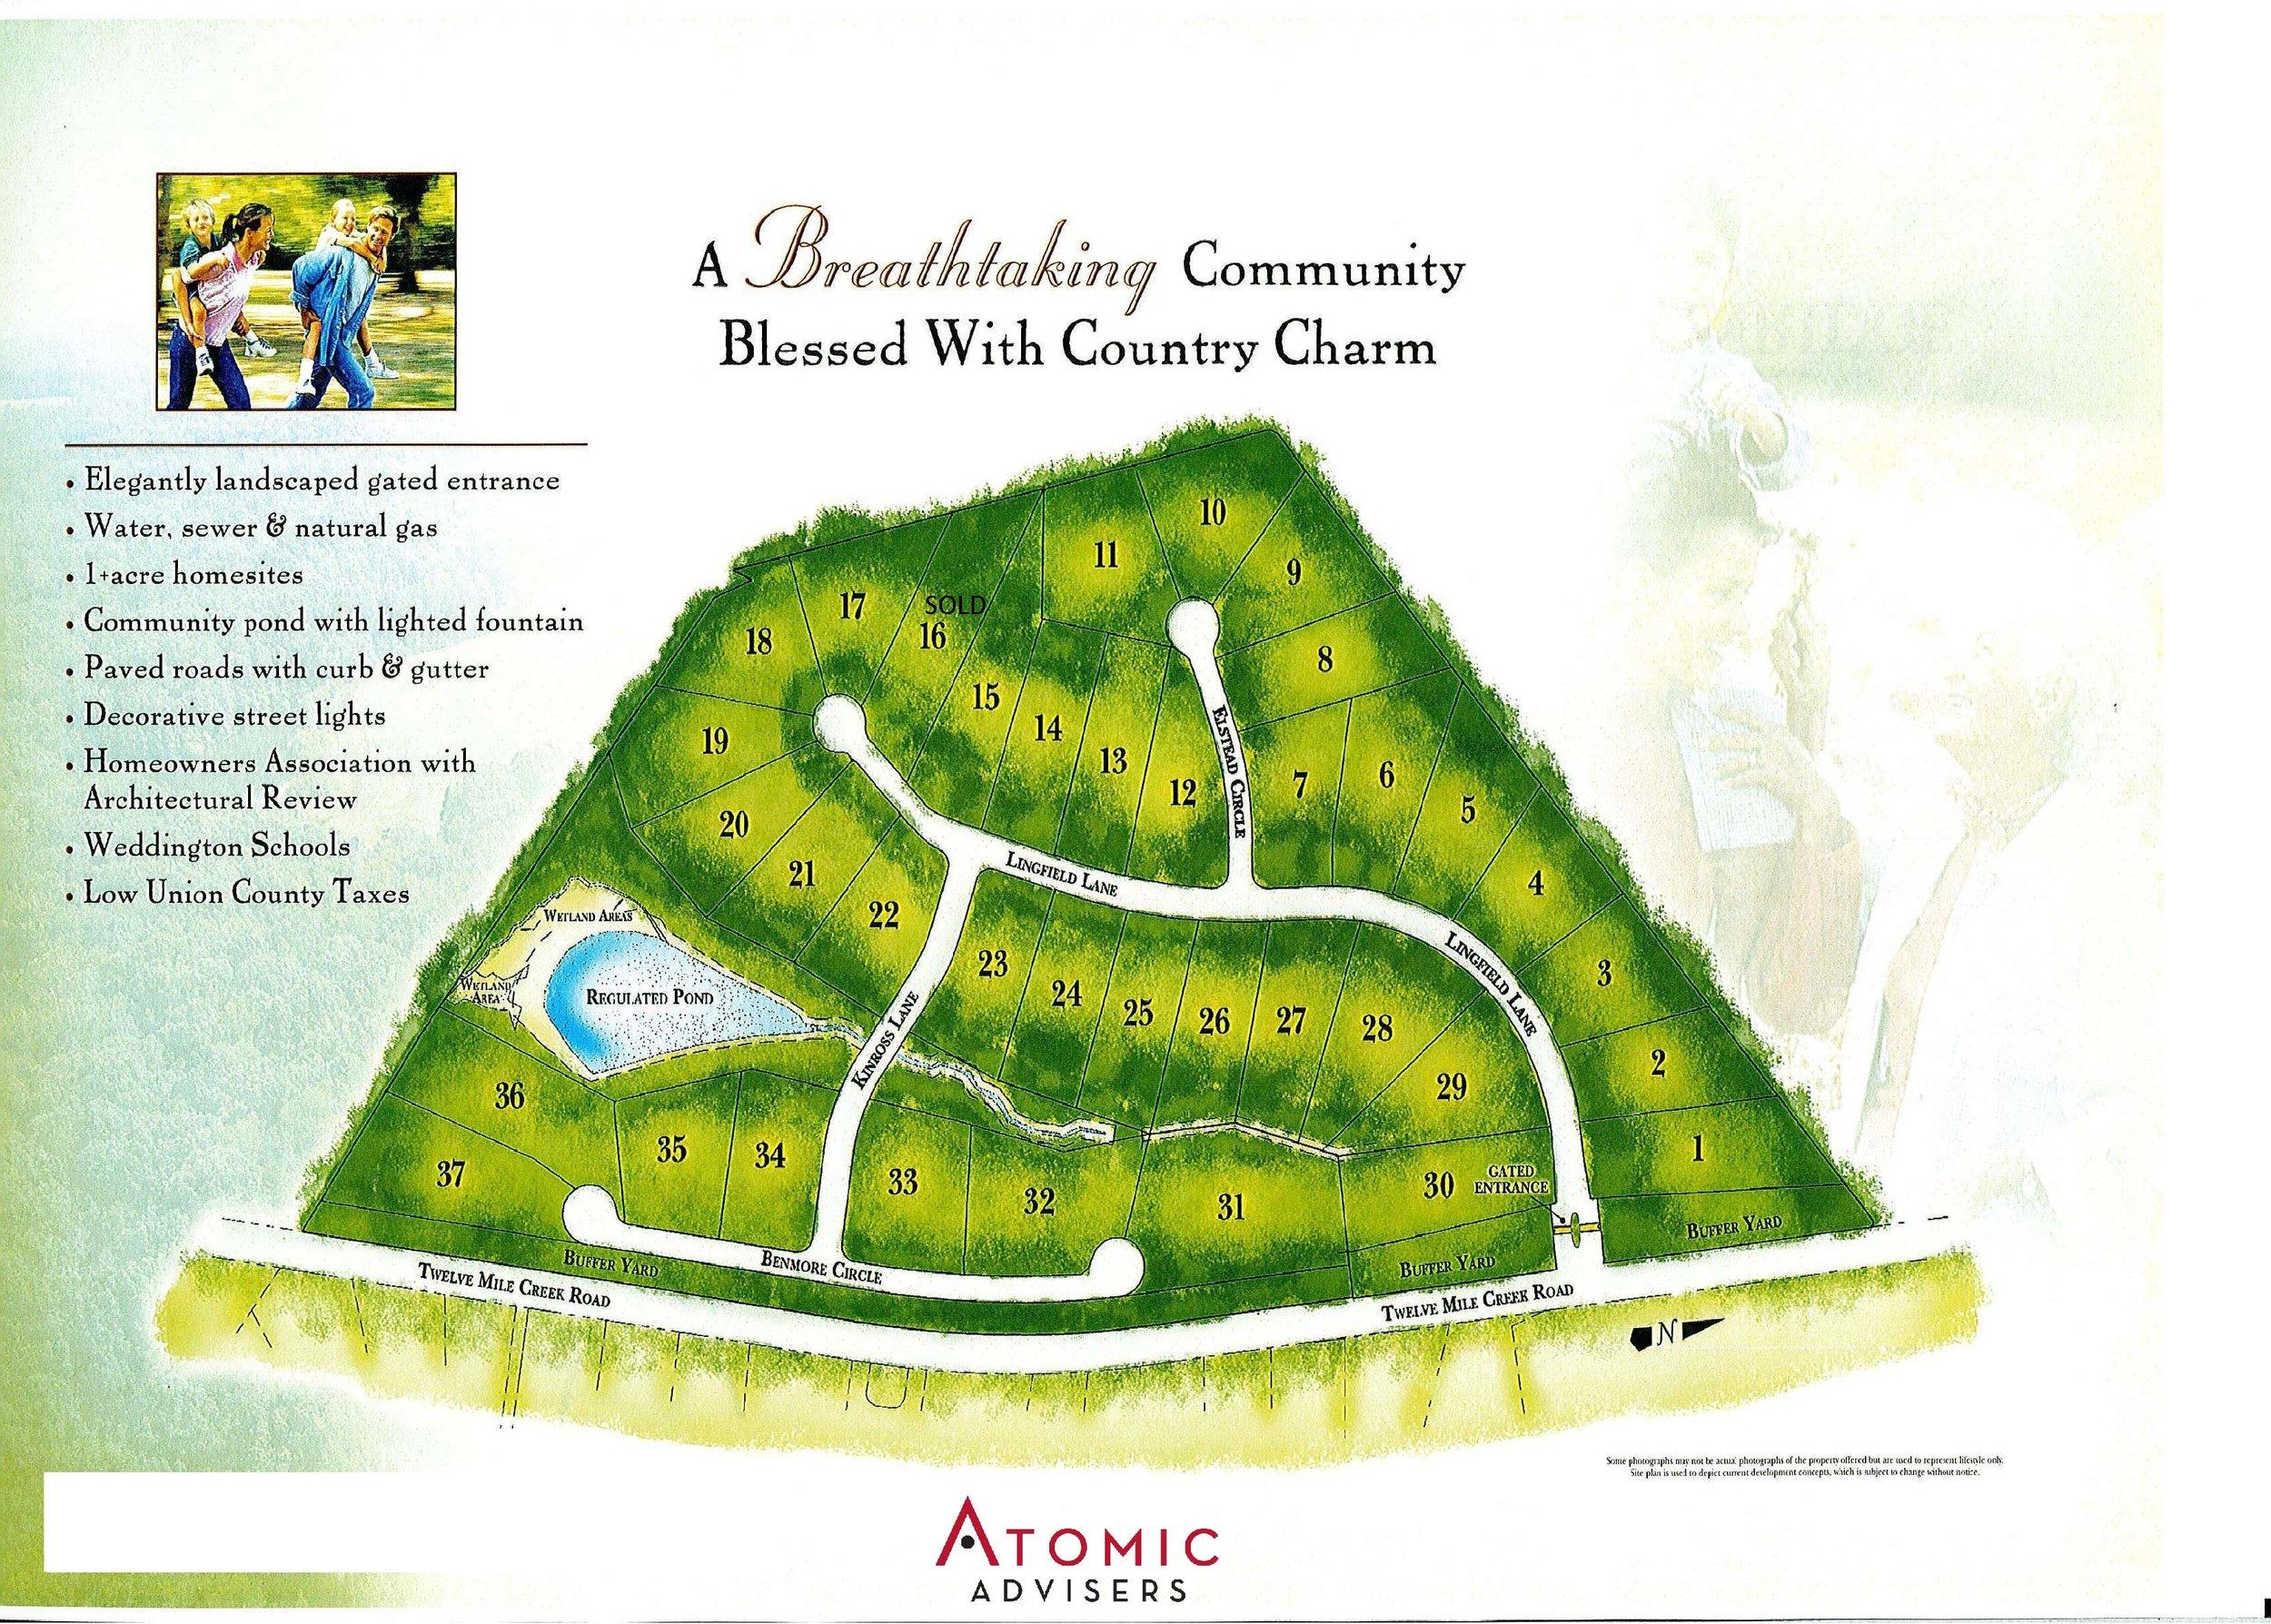 Atomic - DEVONRIDGErevisedsitemap 120711 1a.jpg